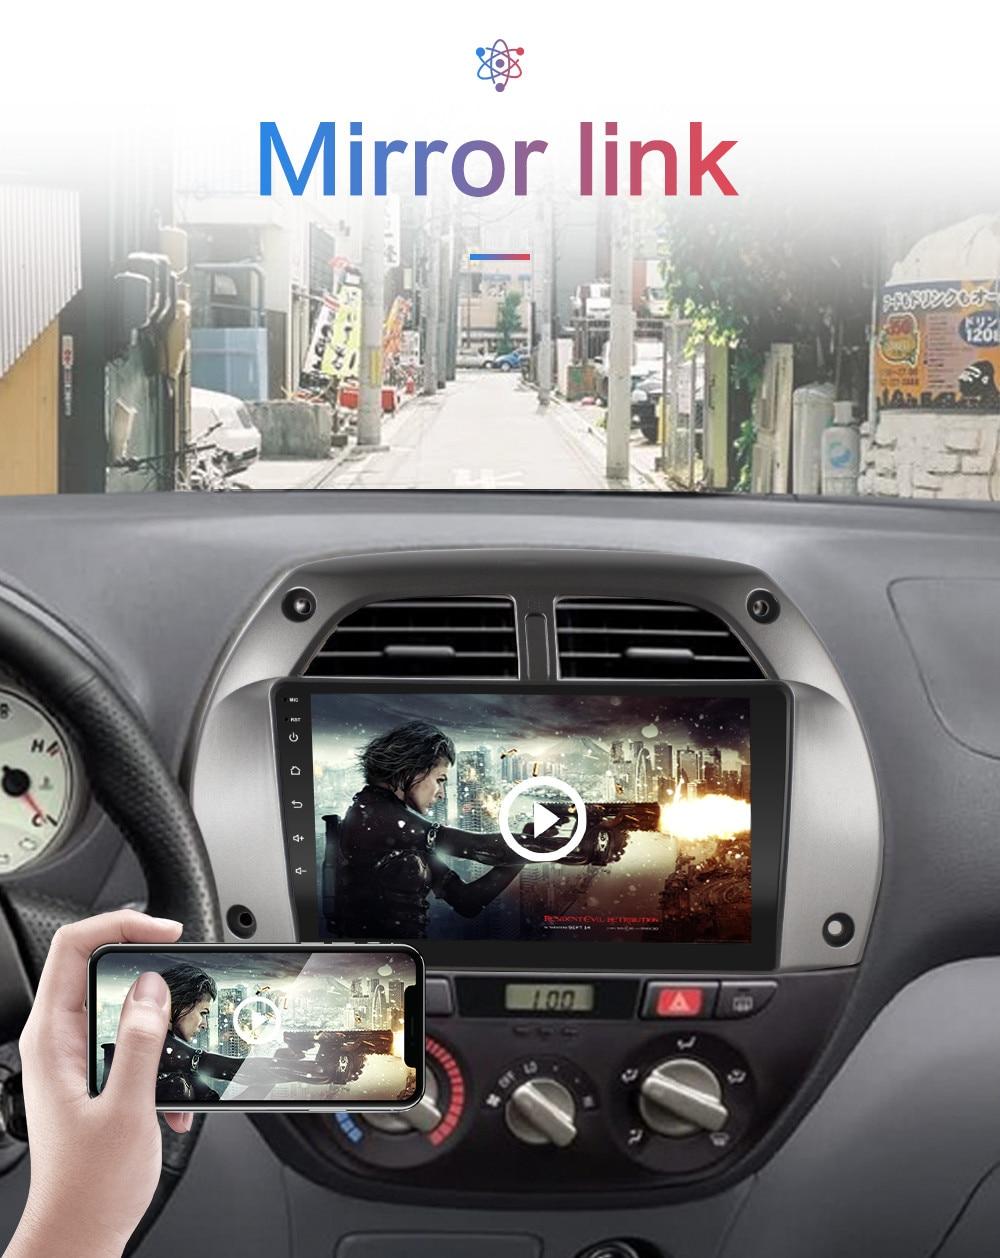 Rádio multimídia automotivo, rádio multimídia automotivo com